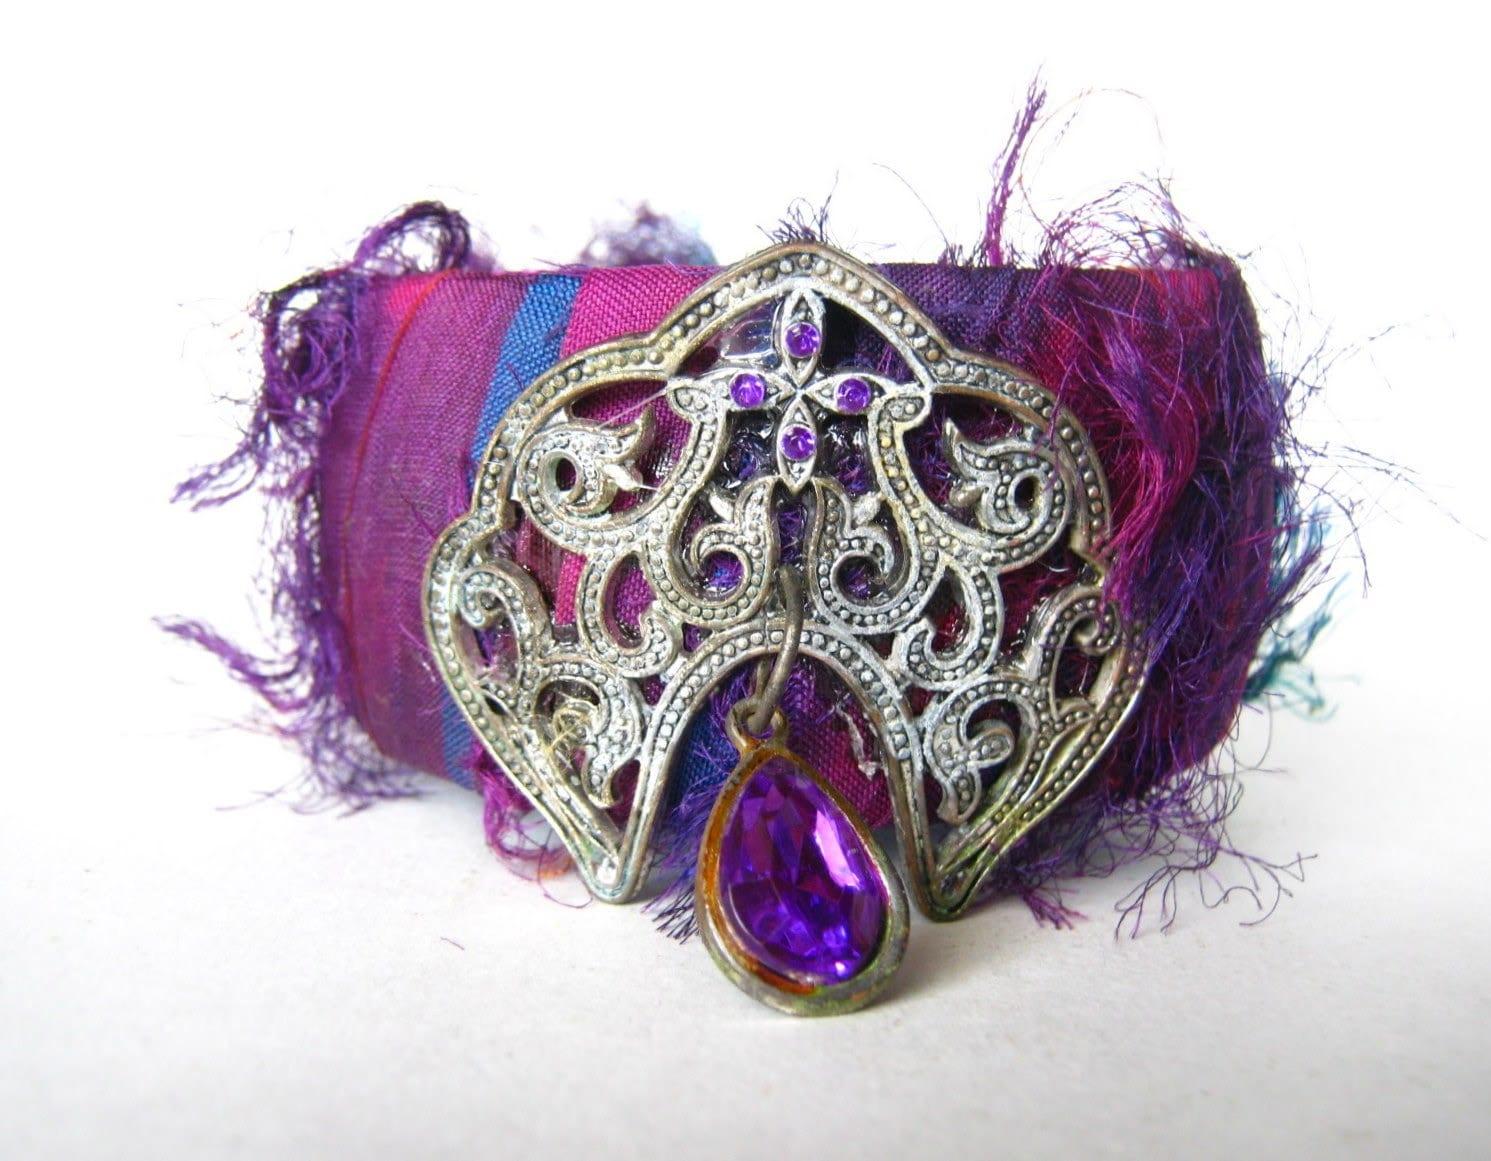 amethyst sari silk wrapped cuff bracelet - FineAndFunkyJewelry